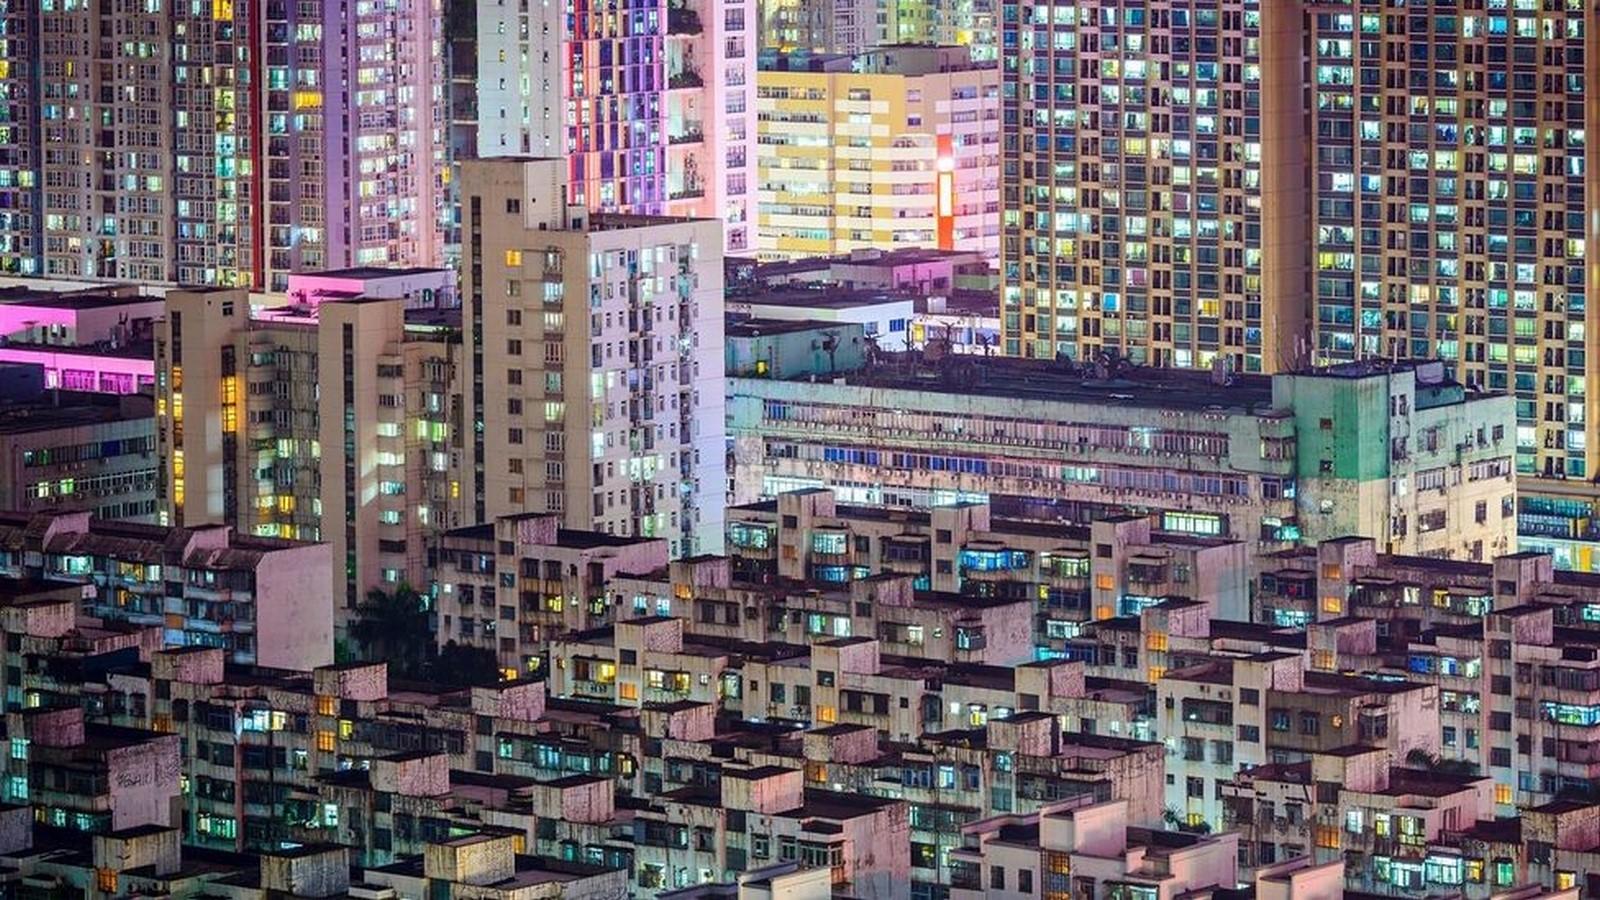 Psychological Studies of Urban Environments - Sheet3